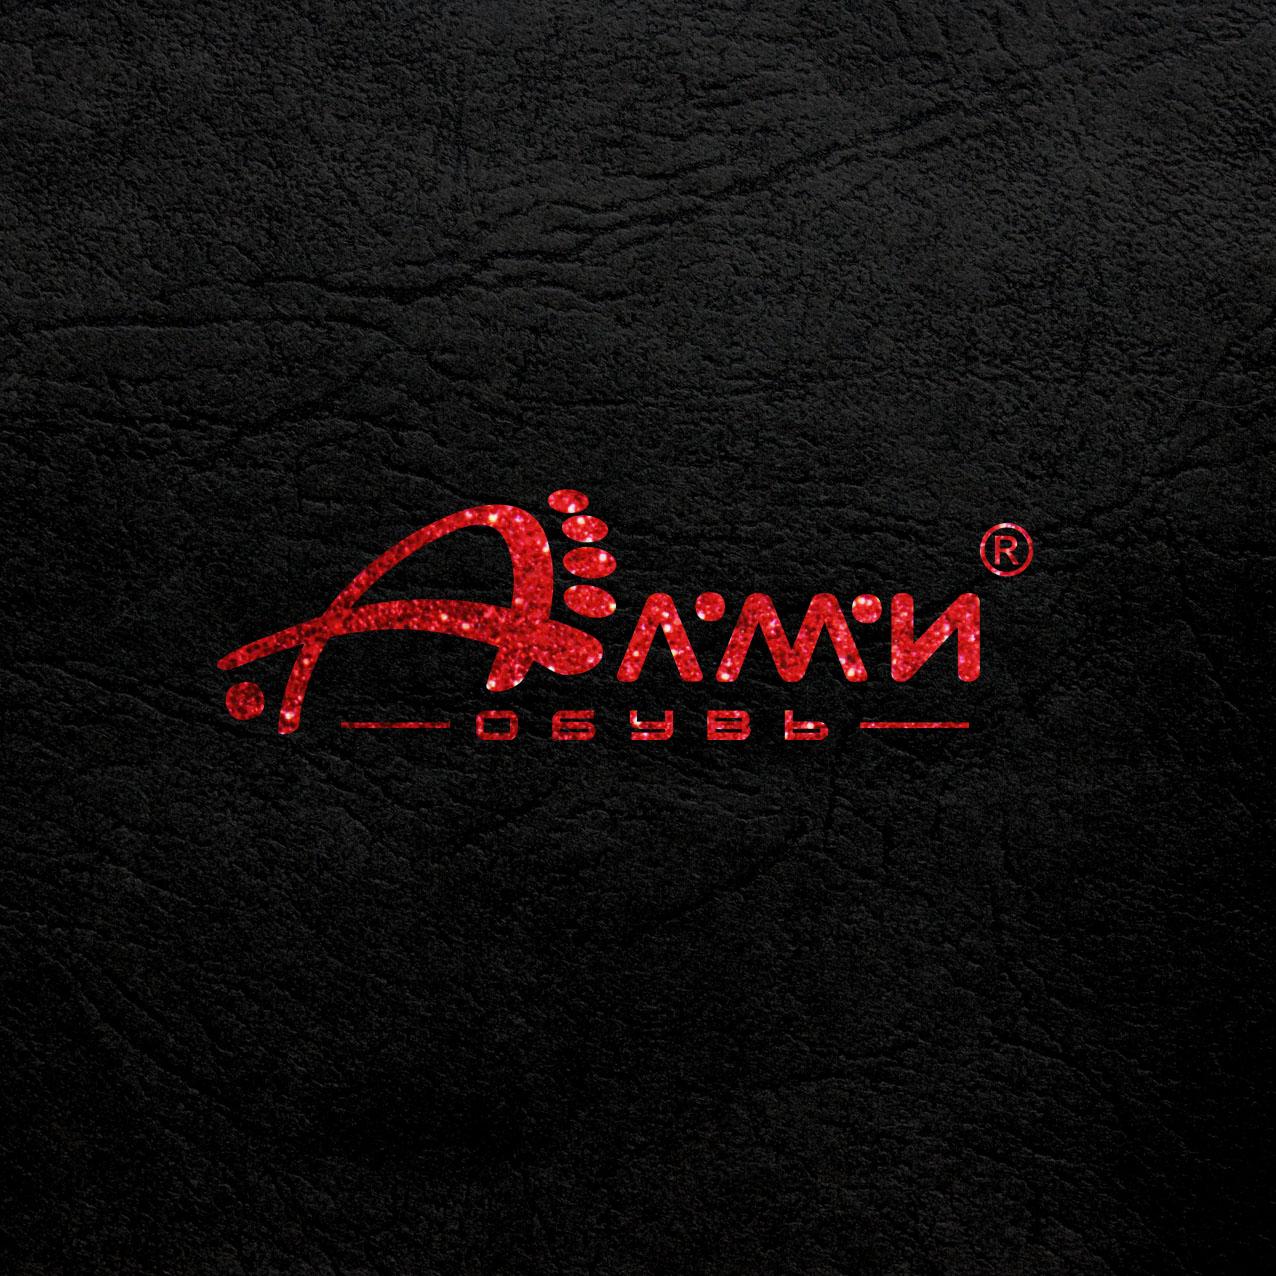 Дизайн логотипа обувной марки Алми фото f_16259f1d02389dc7.jpg